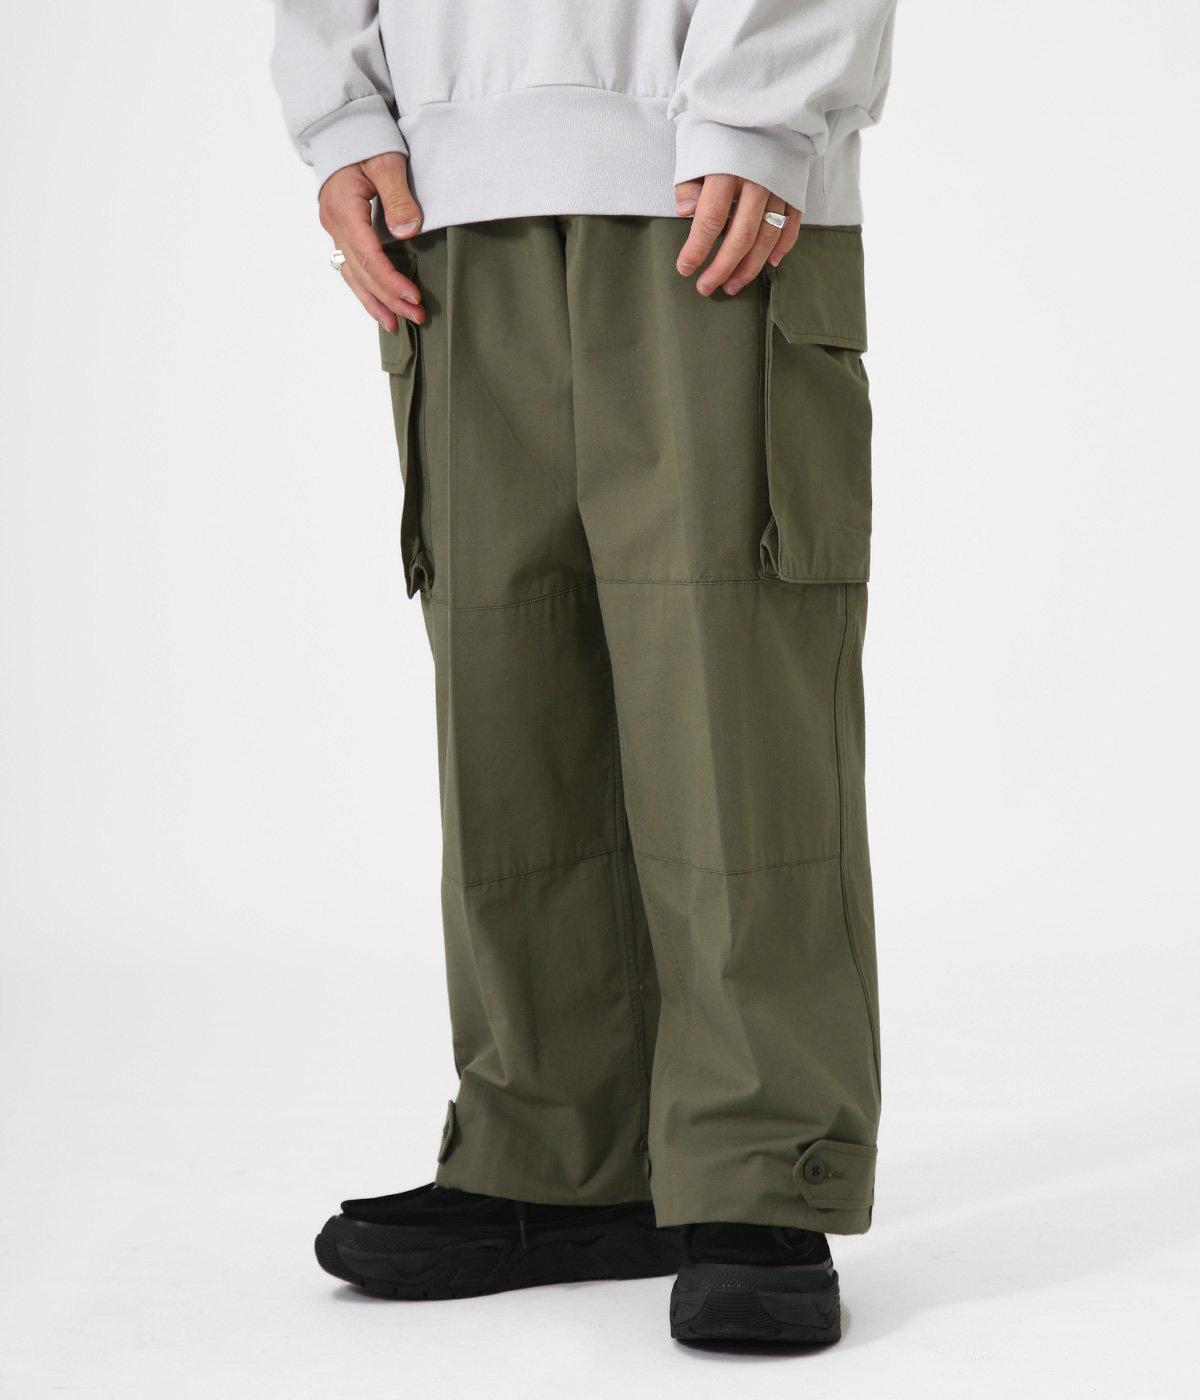 CARGO PANTS - organic cotton compact silk weather -